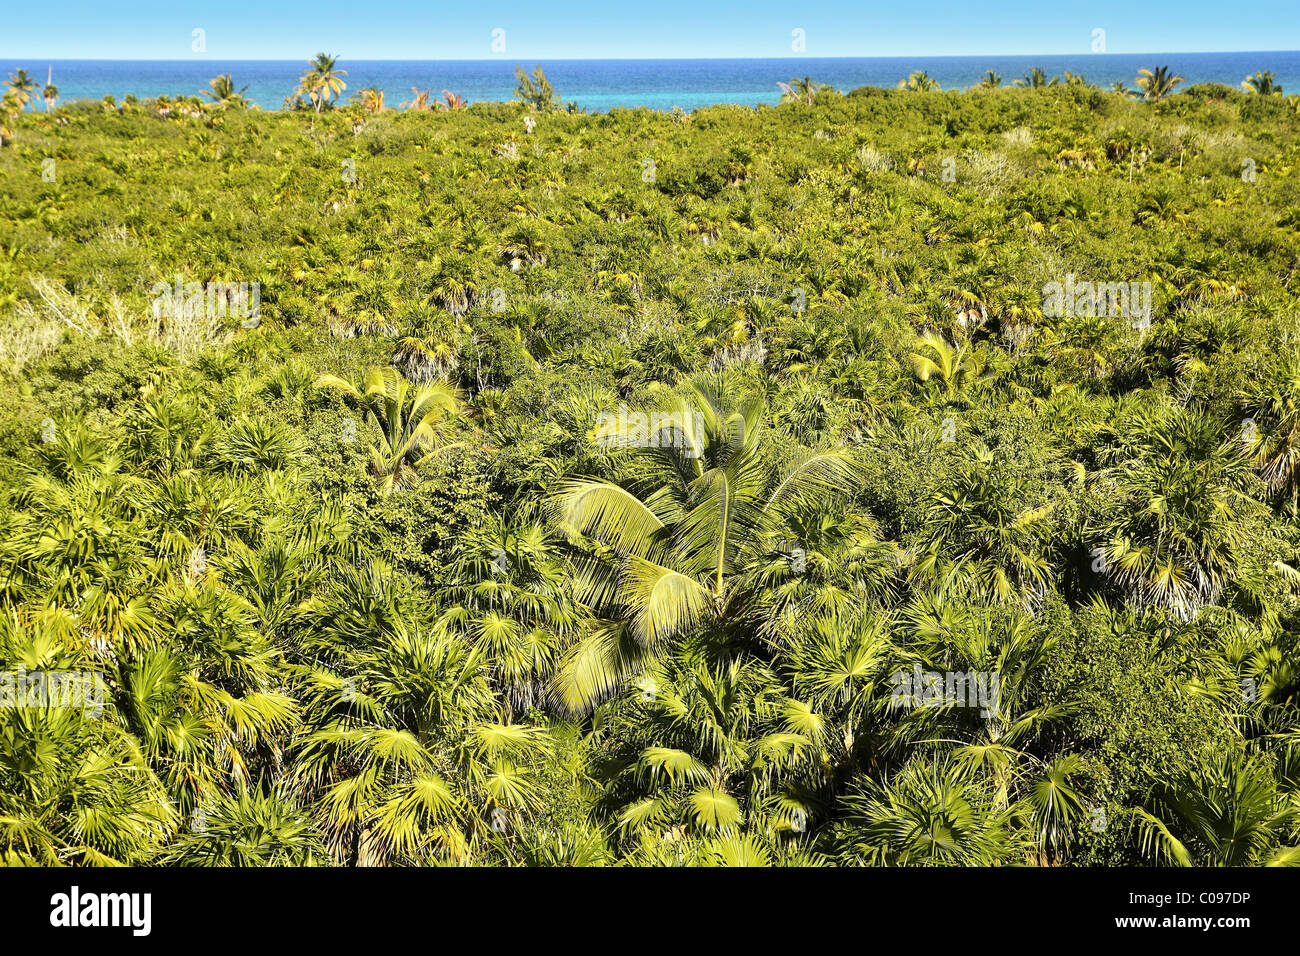 tropical palm tree jungle in Sian Kaan near Tulum - Stock Image